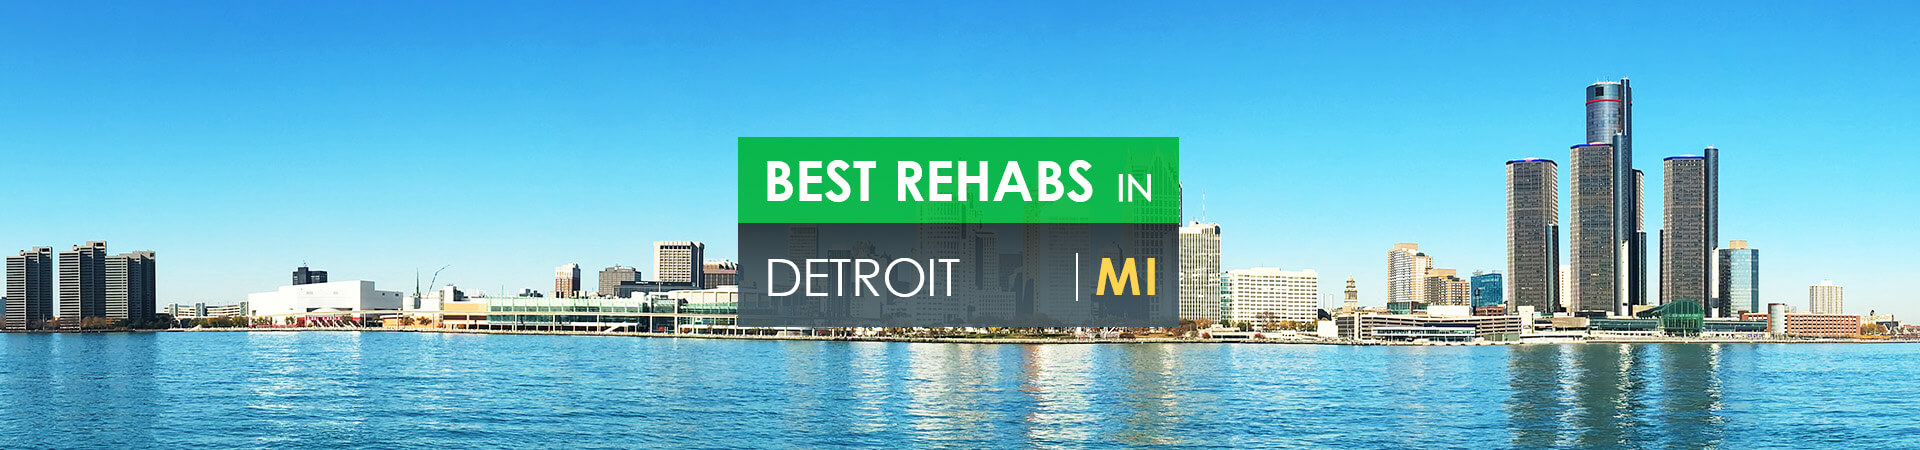 Best rehabs in Detroit, MI